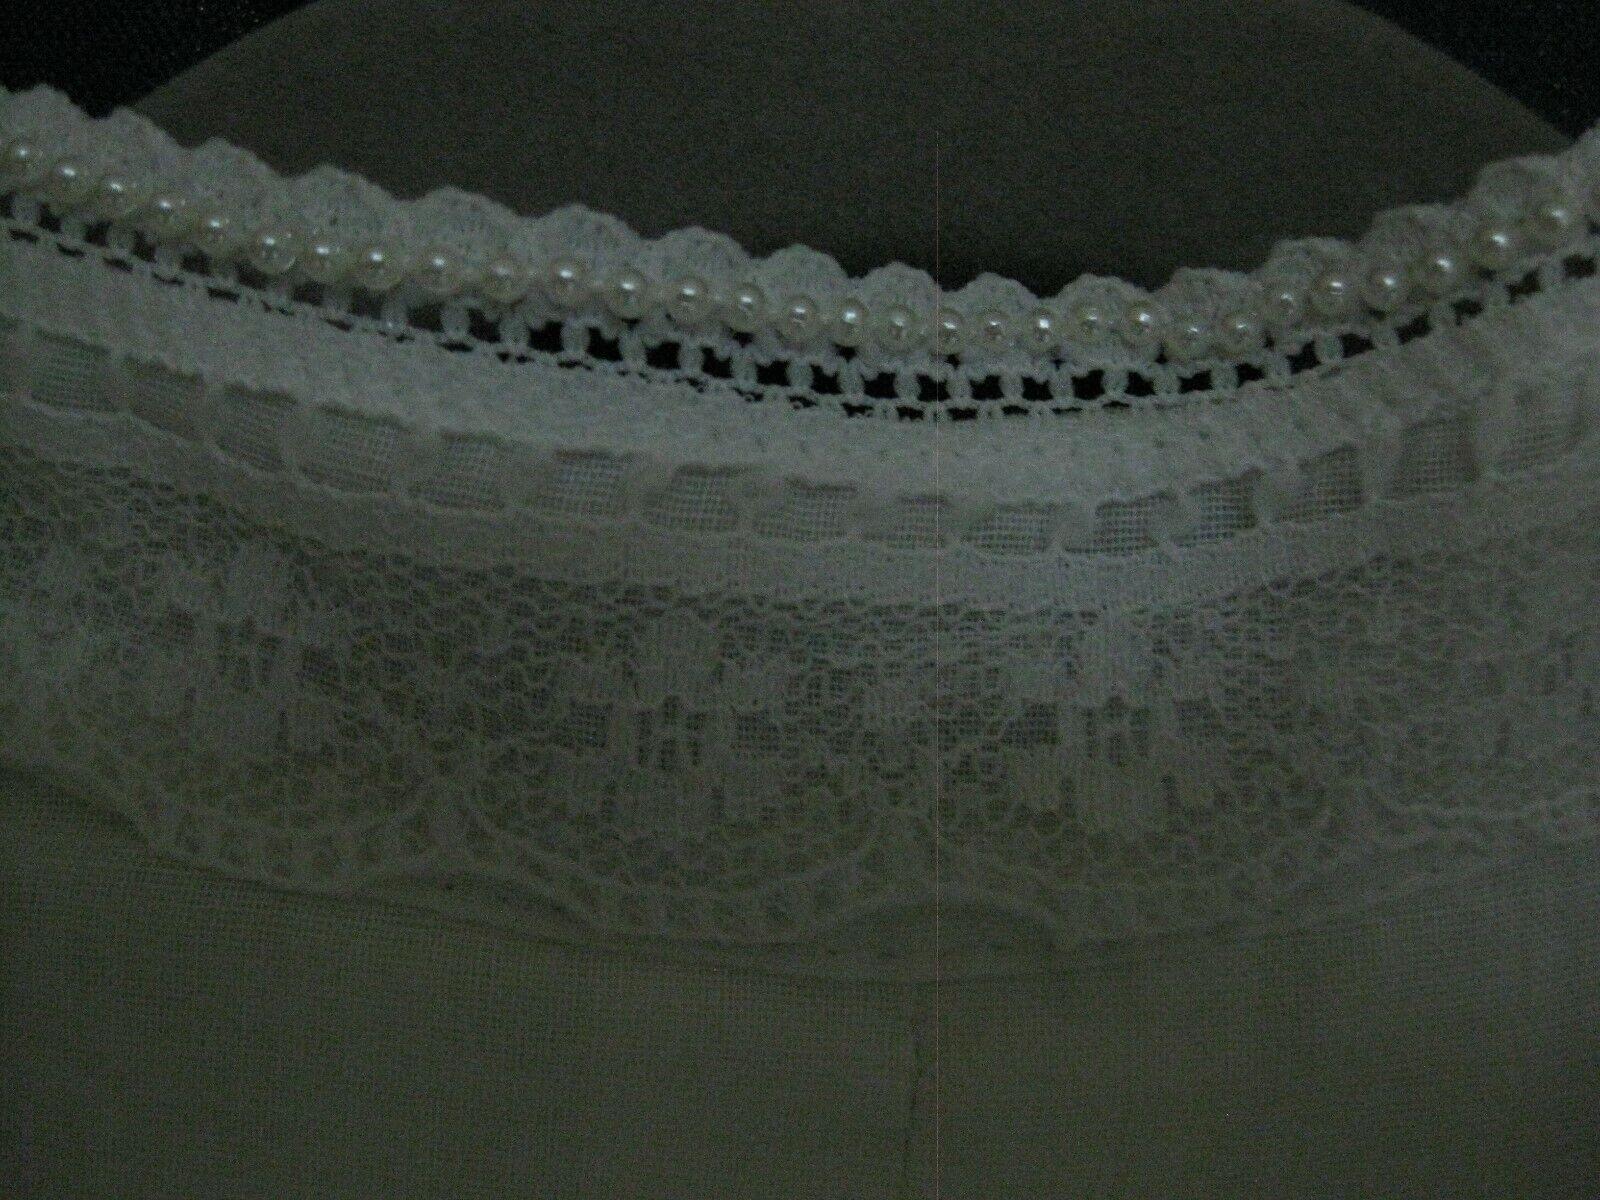 Gunne Sax White Dress Girls Size 12 Pre-Owned - image 8